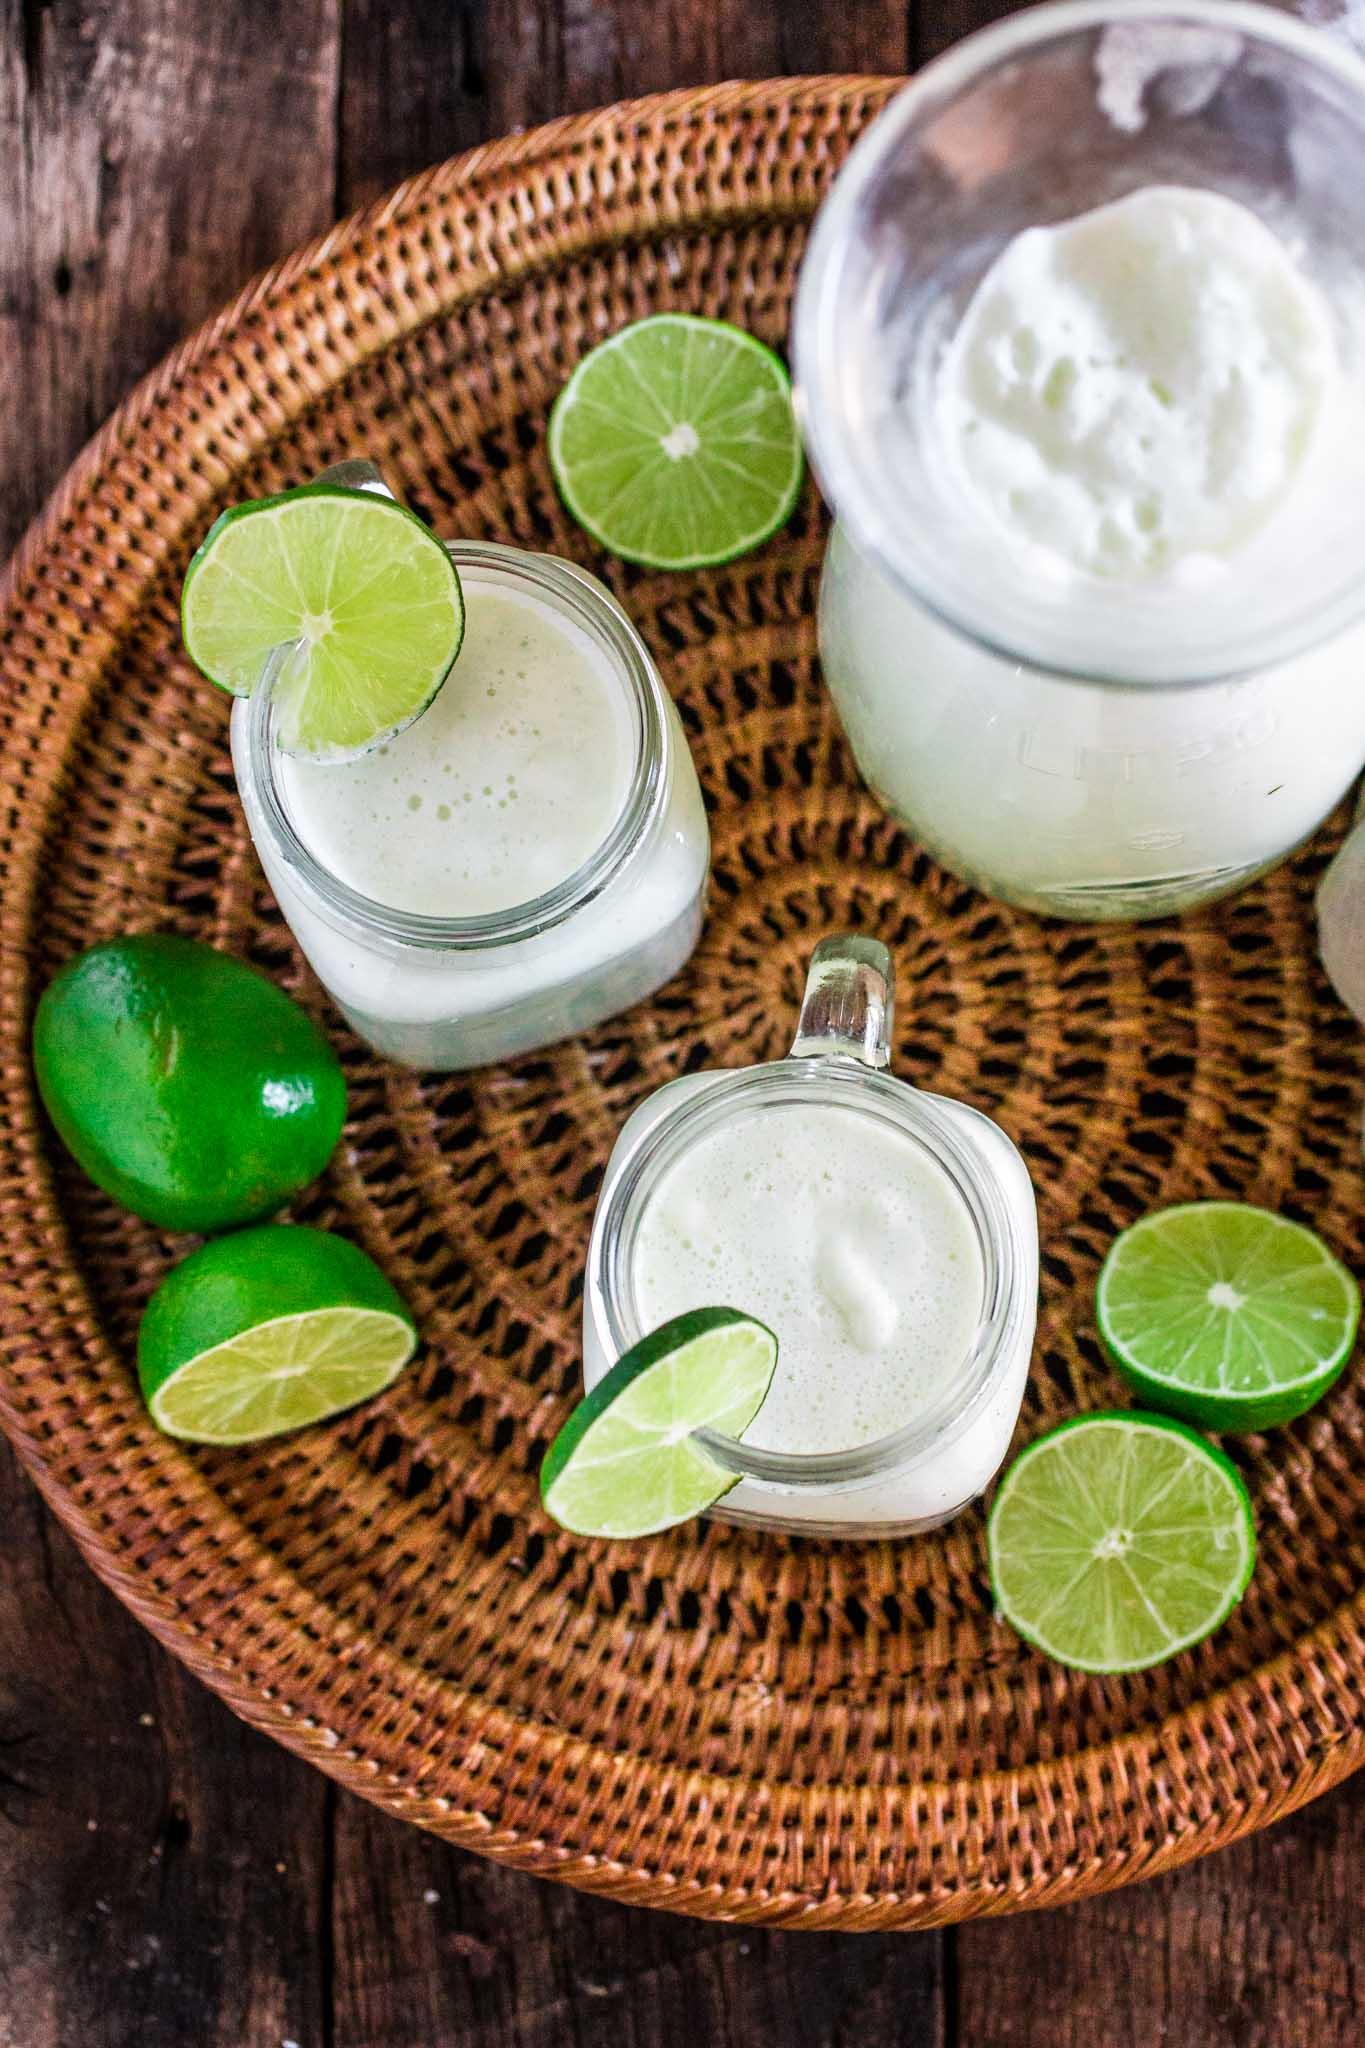 Brazilian Lemonade   www.oliviascuisine.com   The creamiest and sweetest lemonade (or limeade) you have ever tried. The secret? Sweet condensed milk. Sweet just like Brazilians like it!